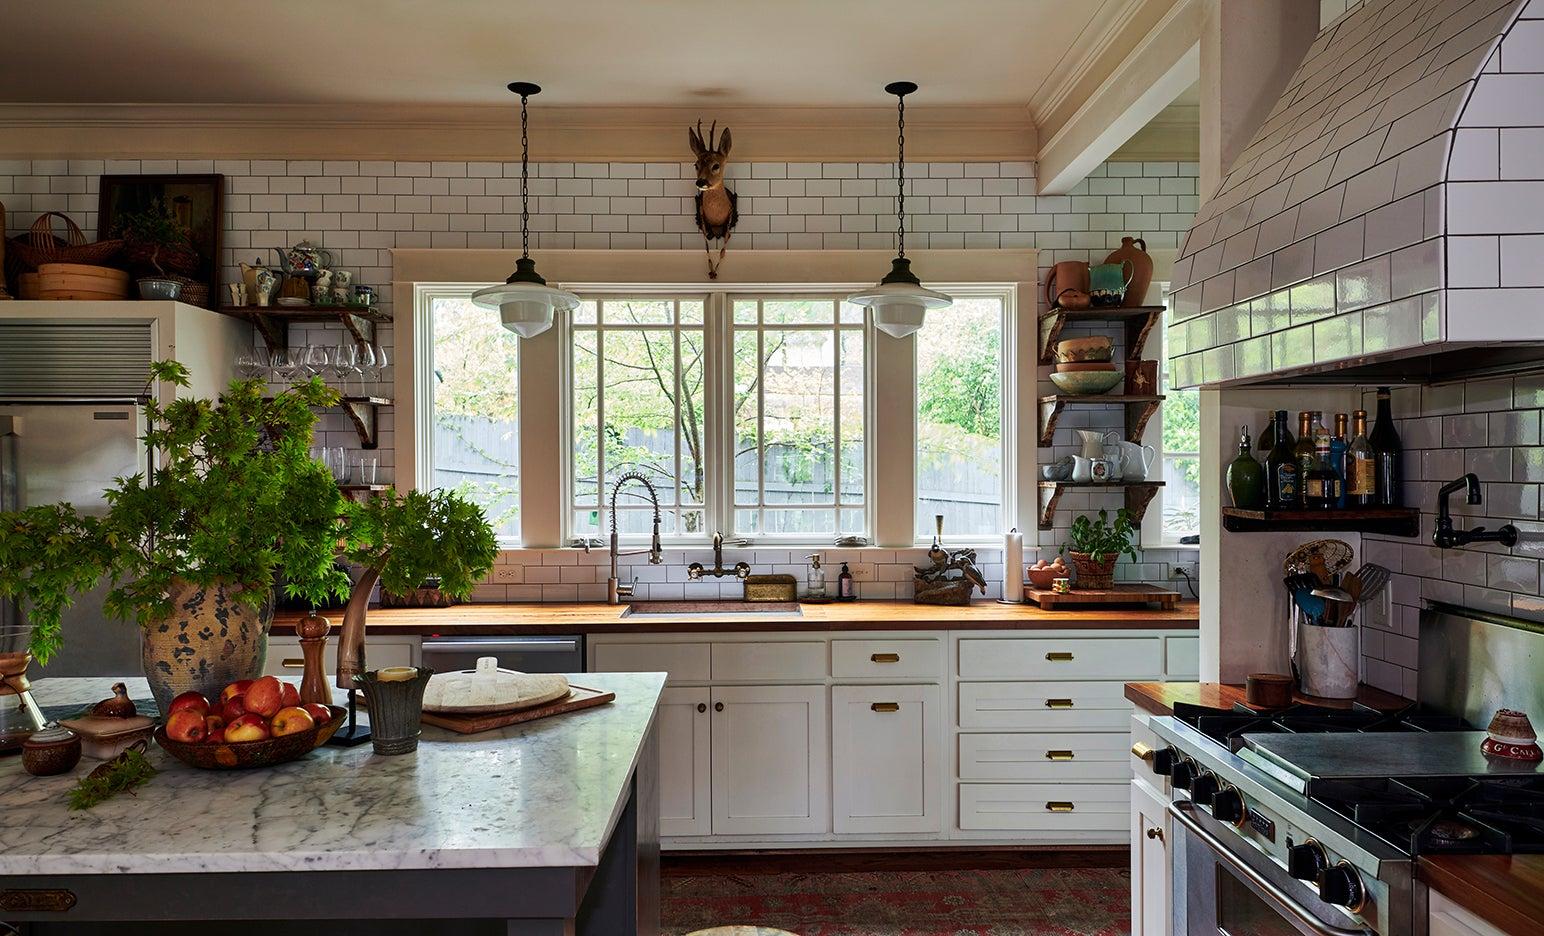 Kitchen with white subway tile walls